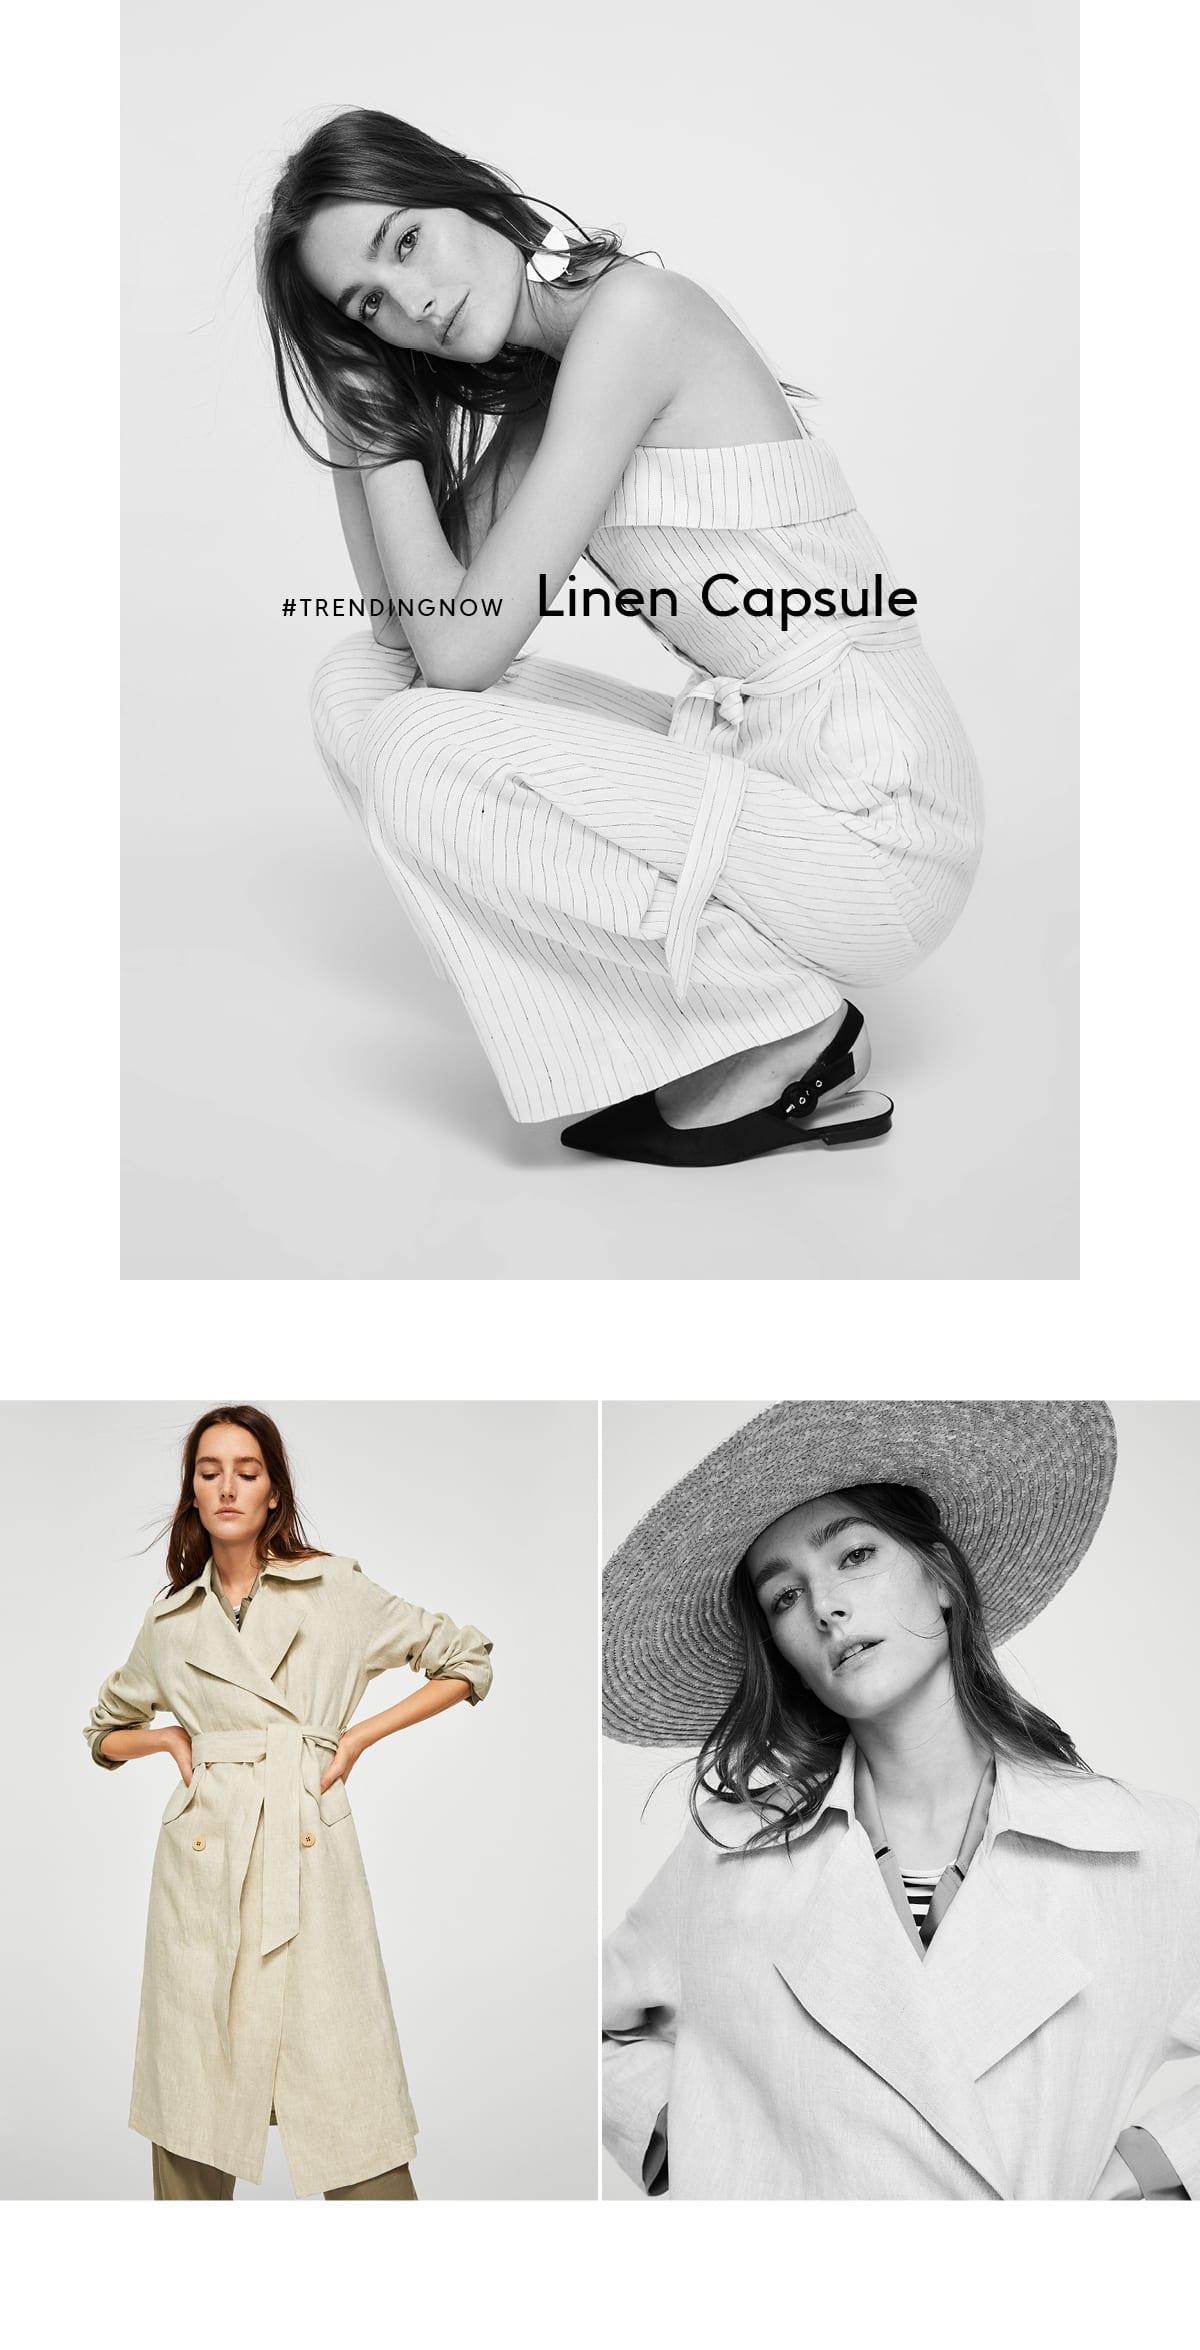 Linen Capsule